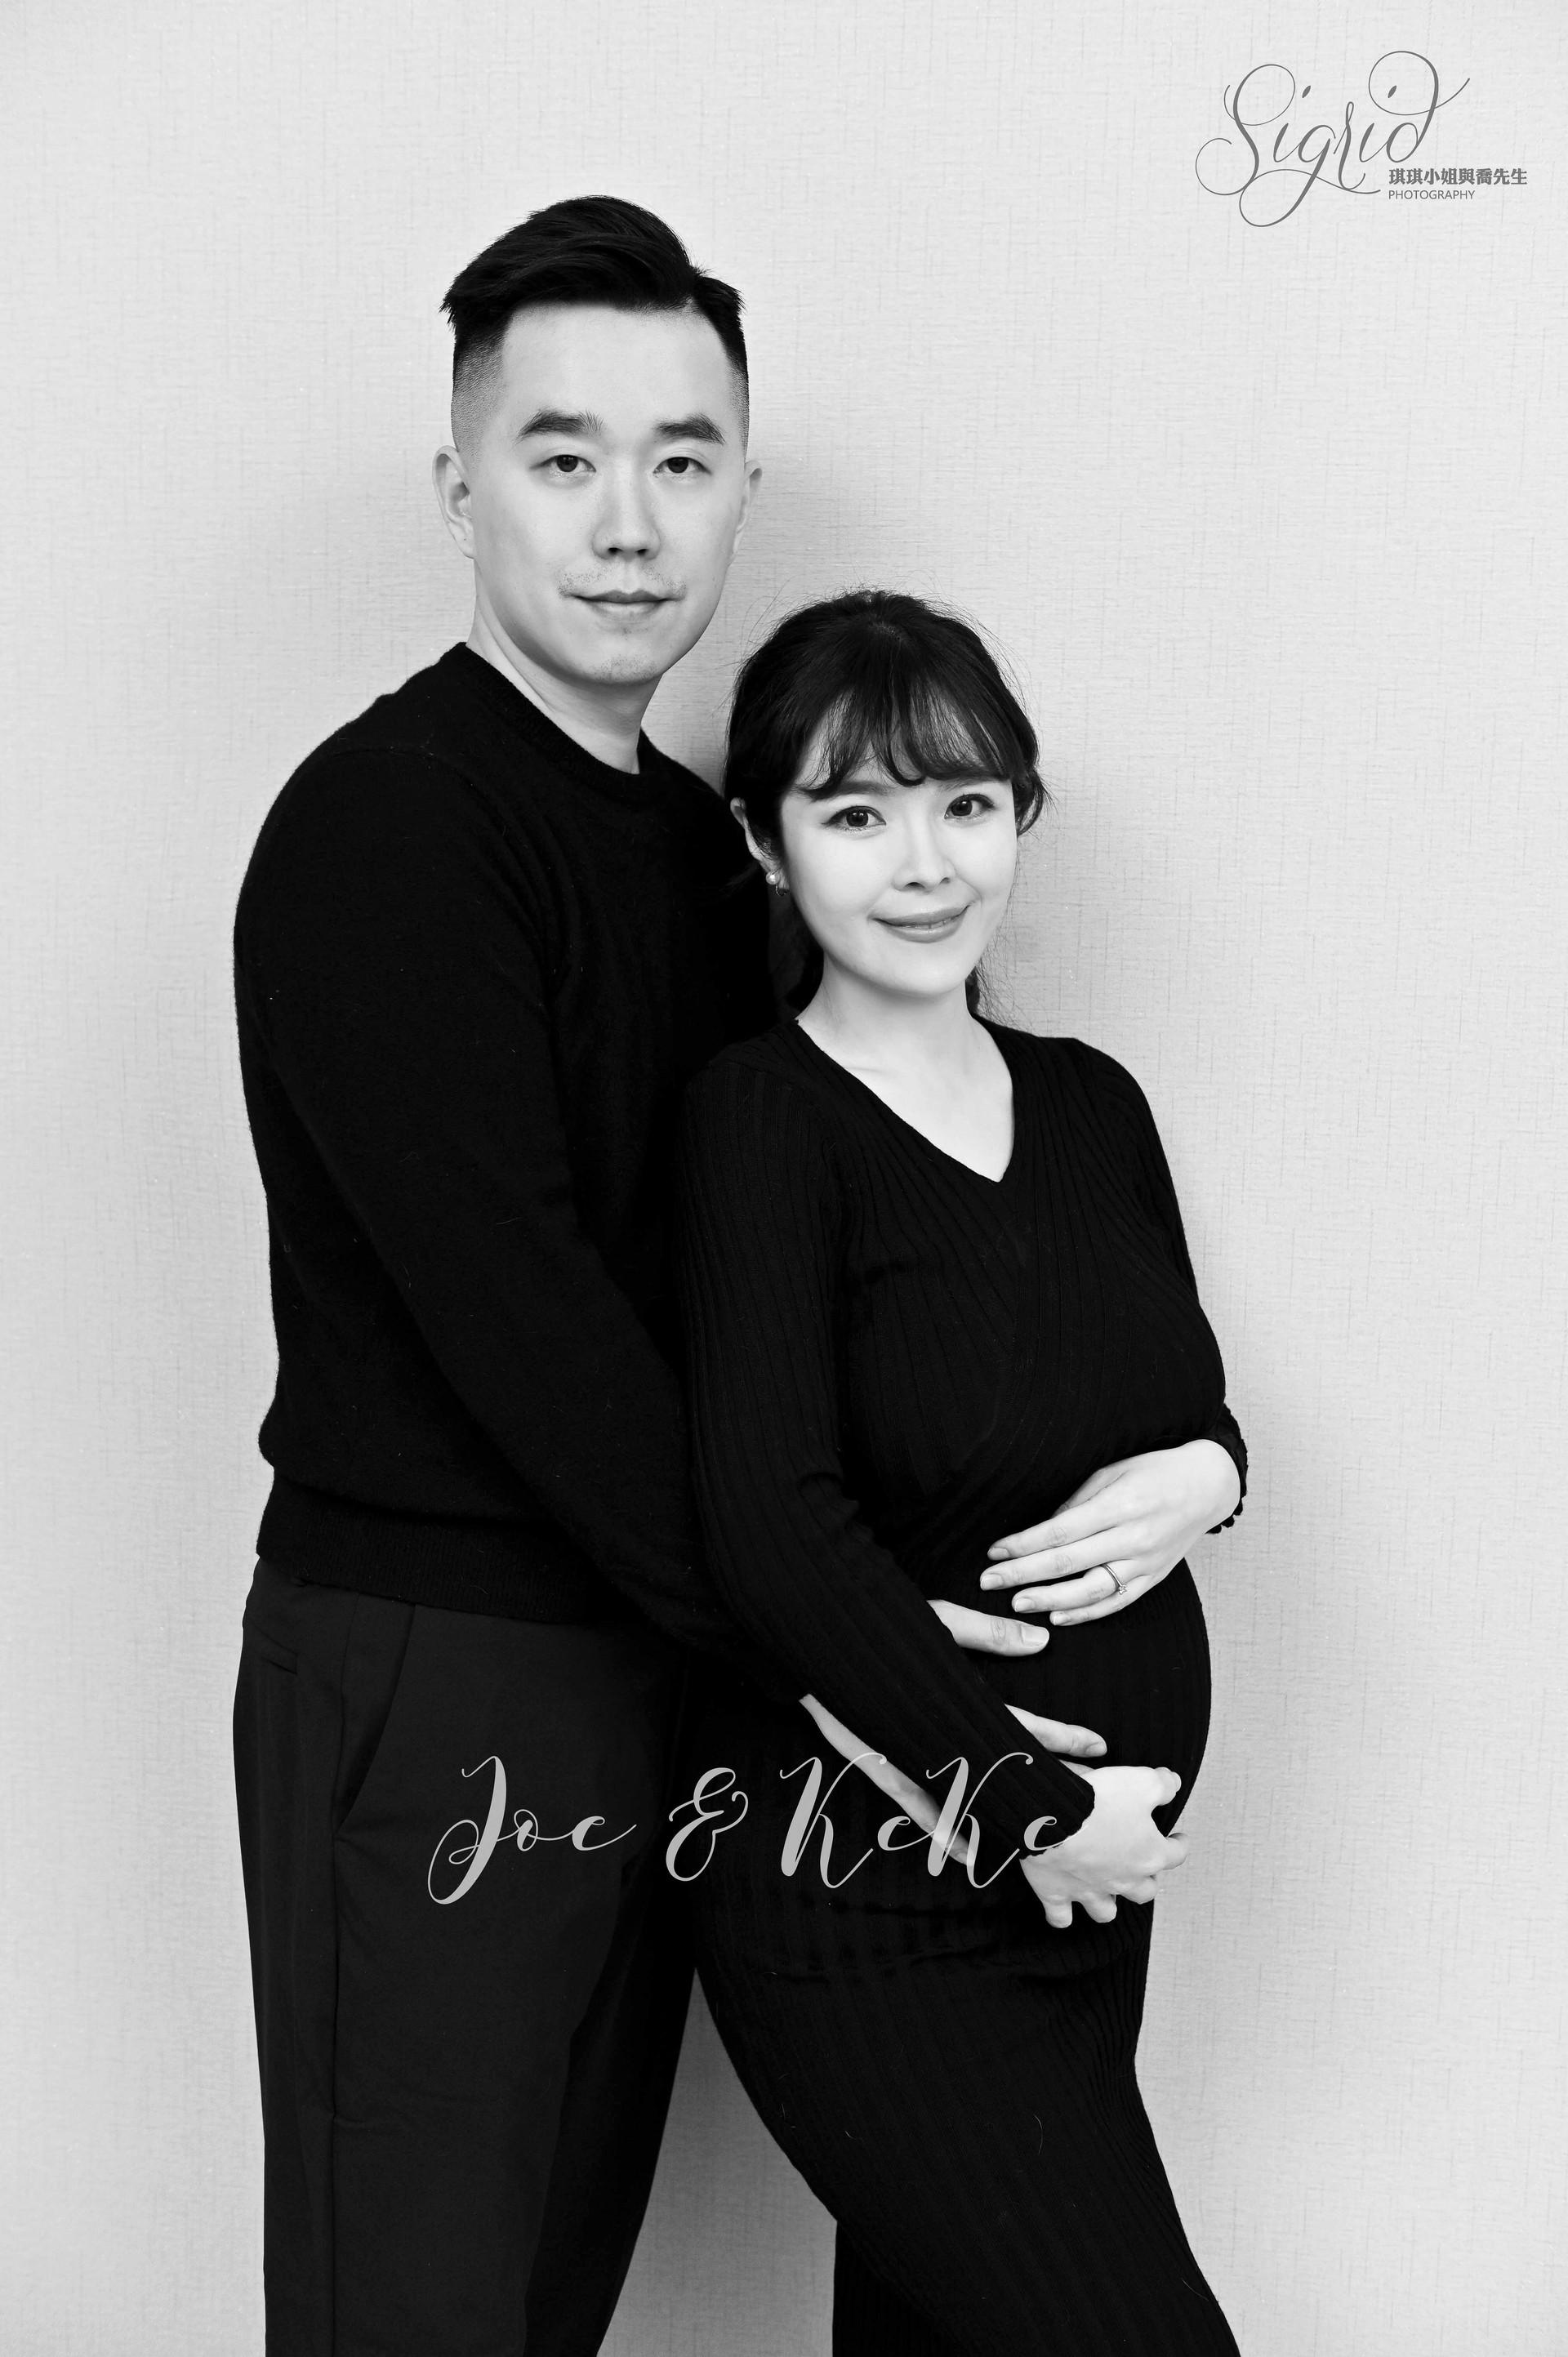 Sigrid Chien Photography琪琪小姐與喬先生 我們的30週孕婦寫真